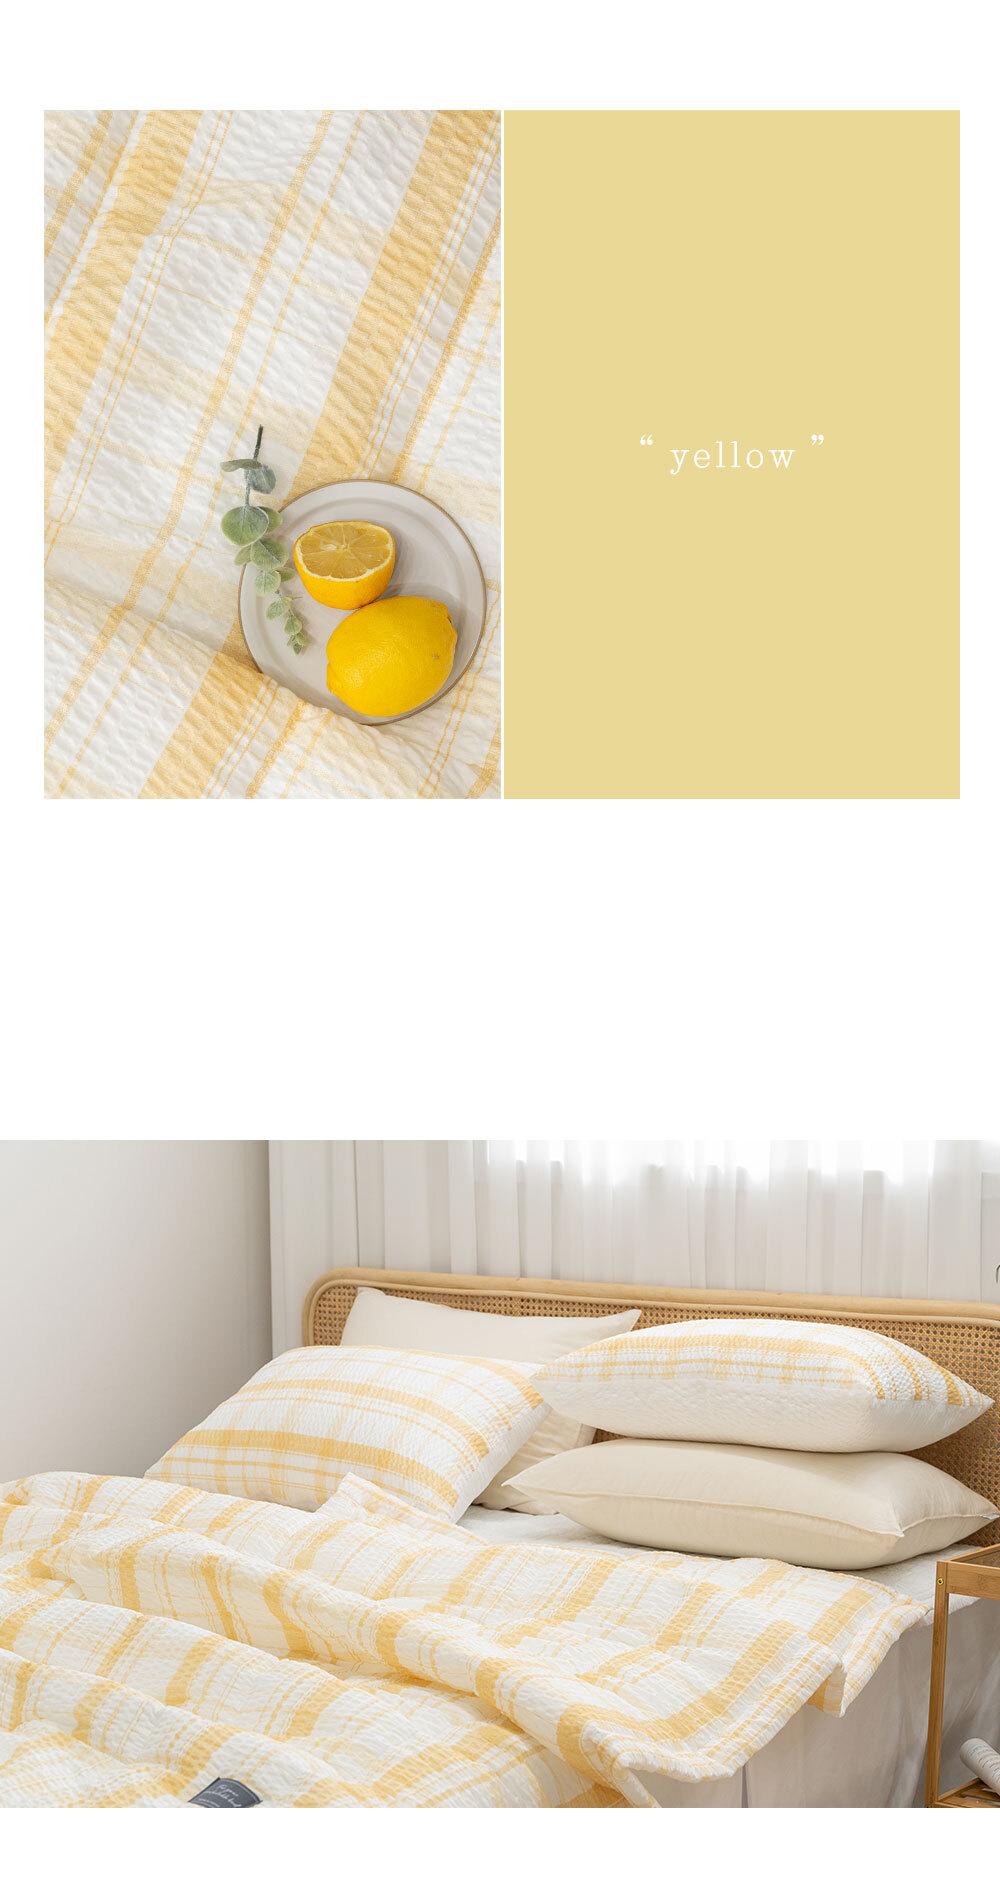 butterring_bed_yellow_04.jpg